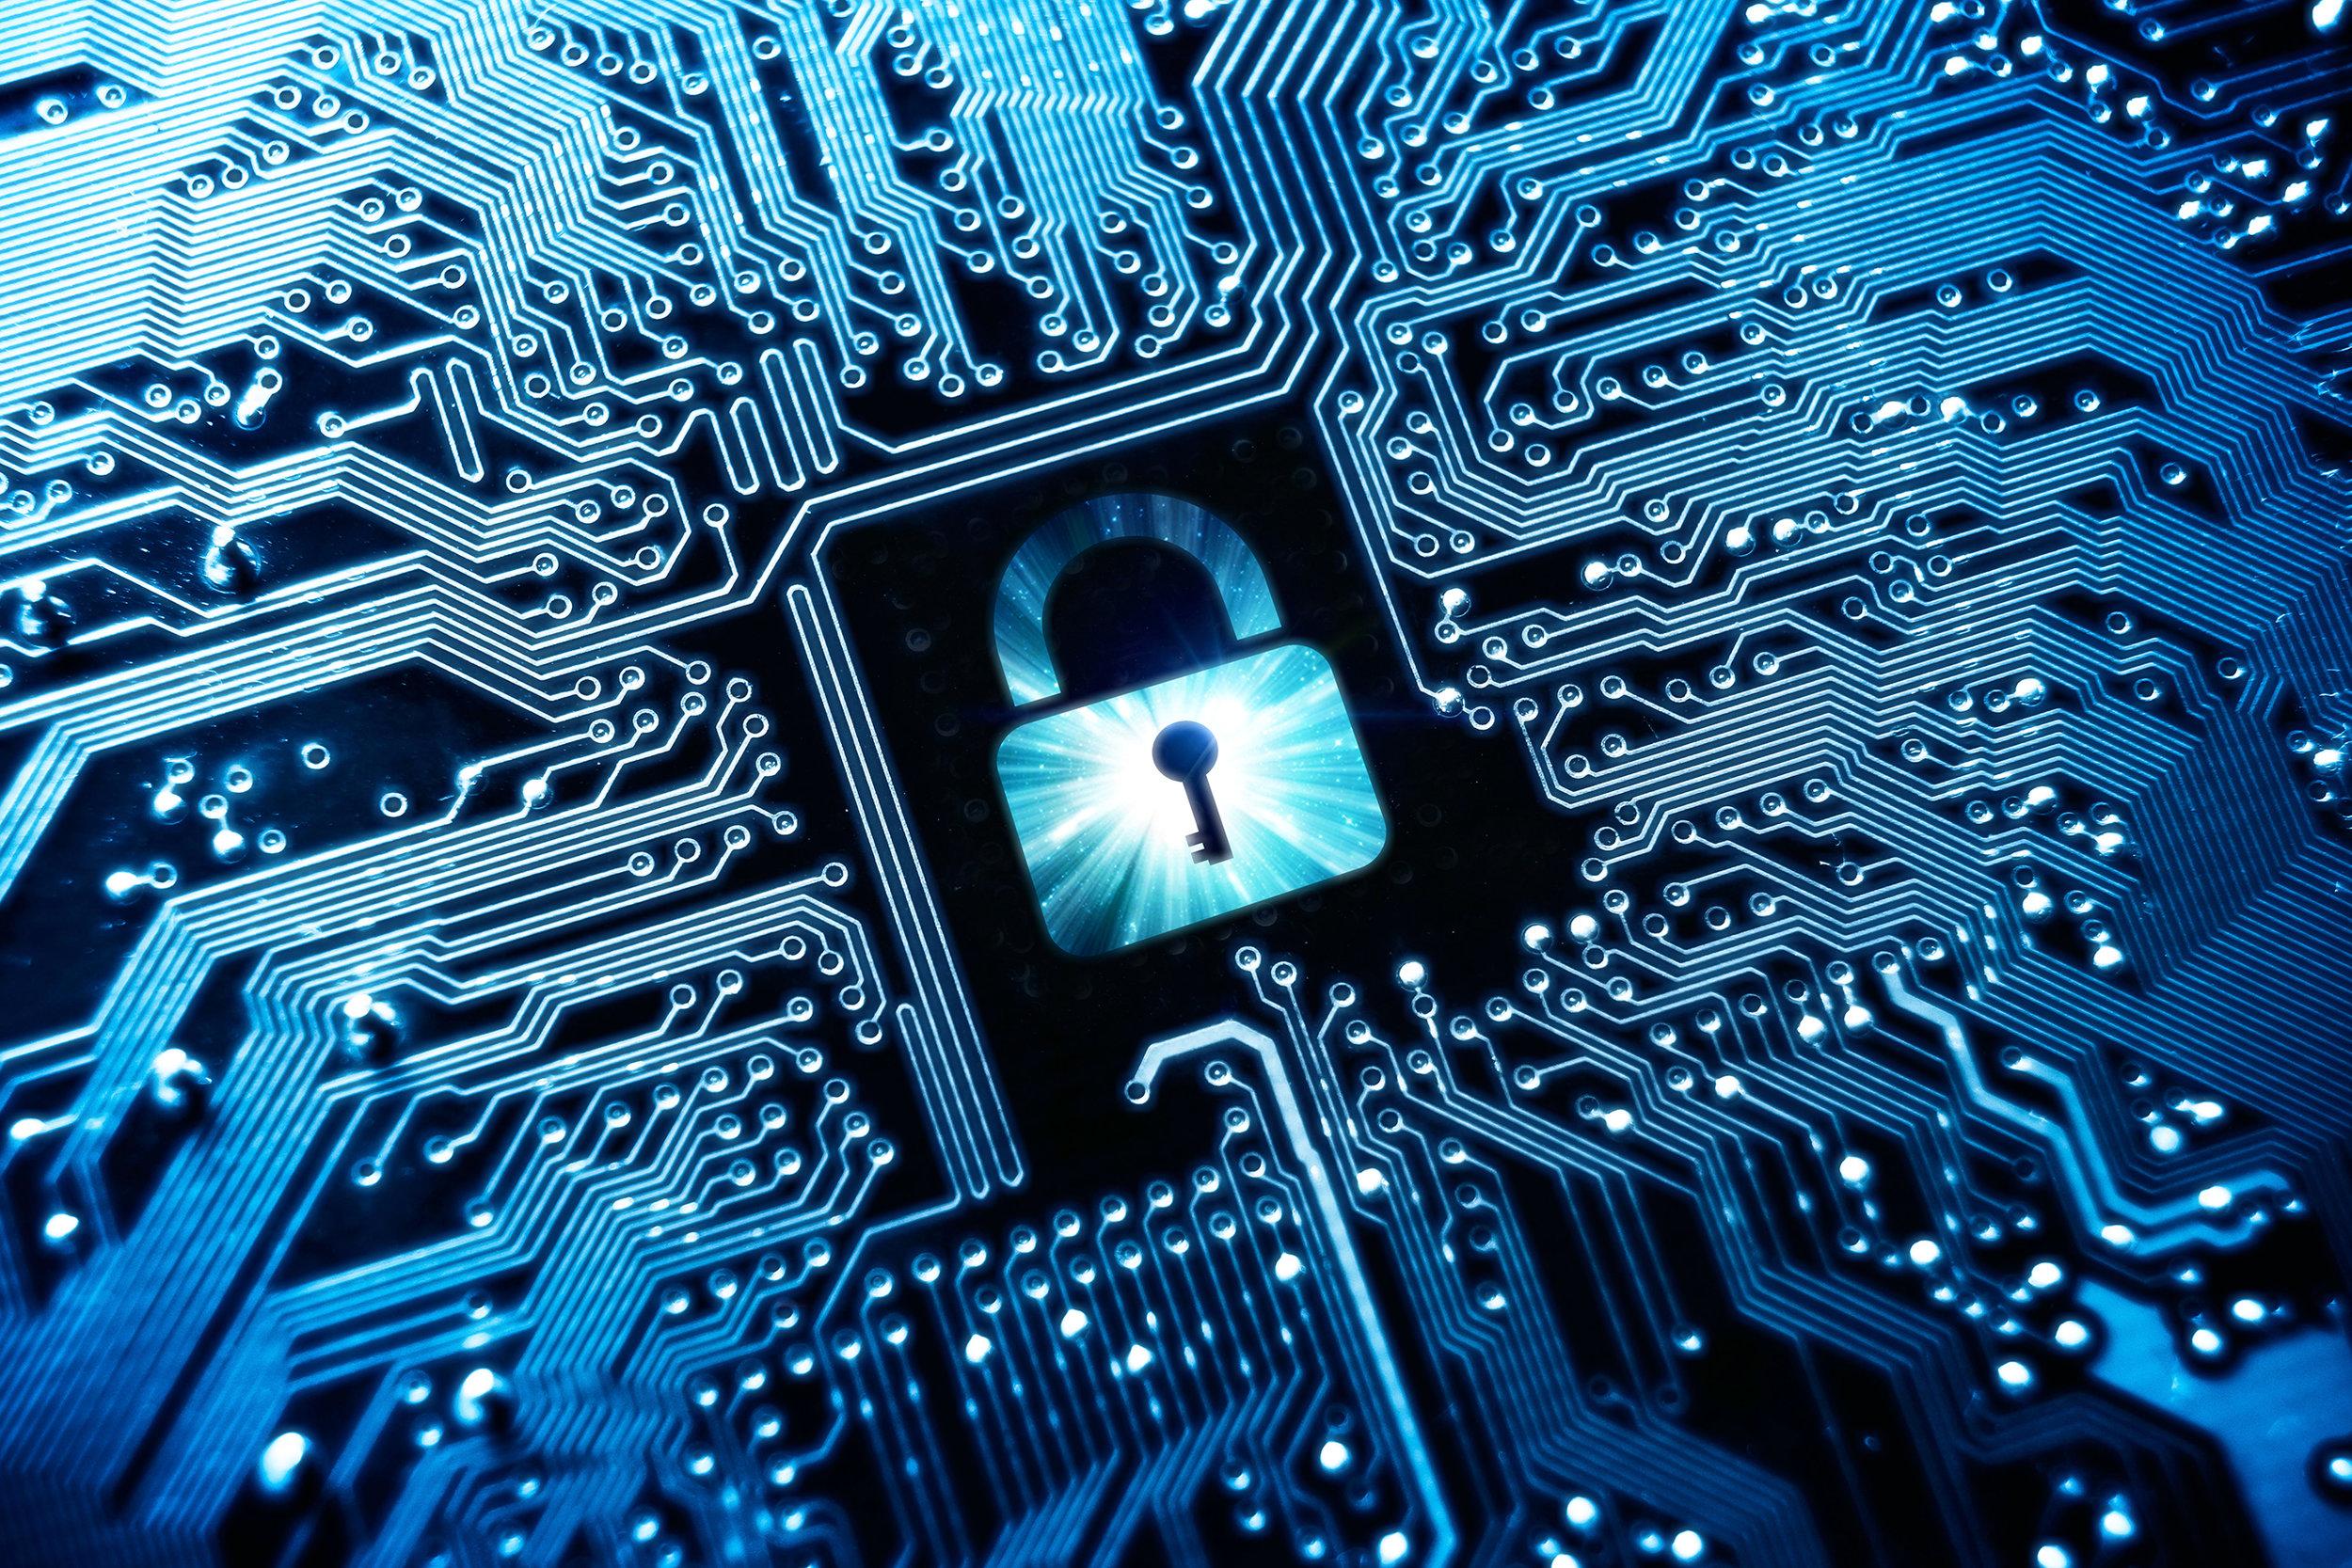 Vodatek-Security-Systems.jpg